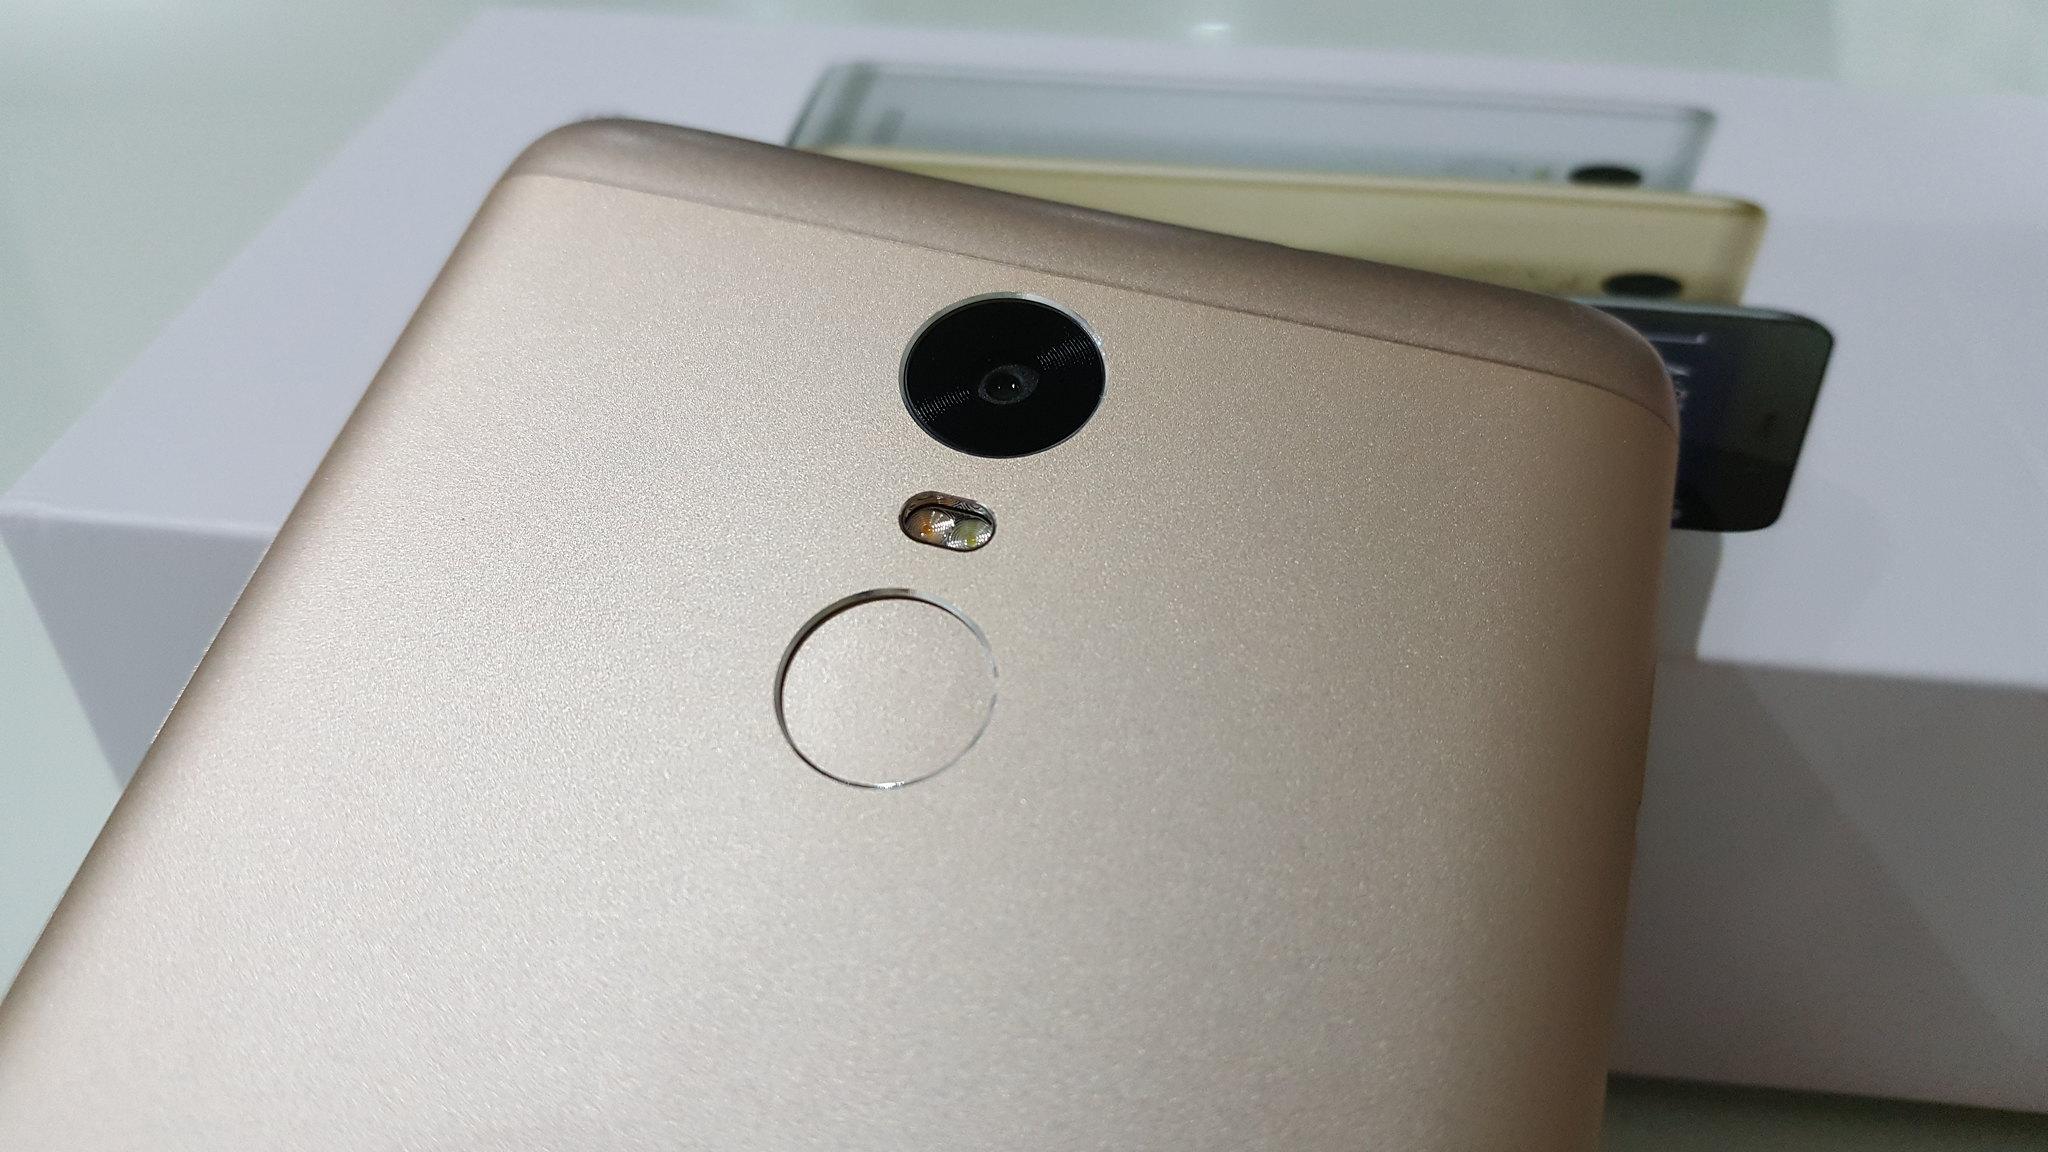 16 Megapixel Rear Camera with Dual tone LED Flash & Fingerprint Reader